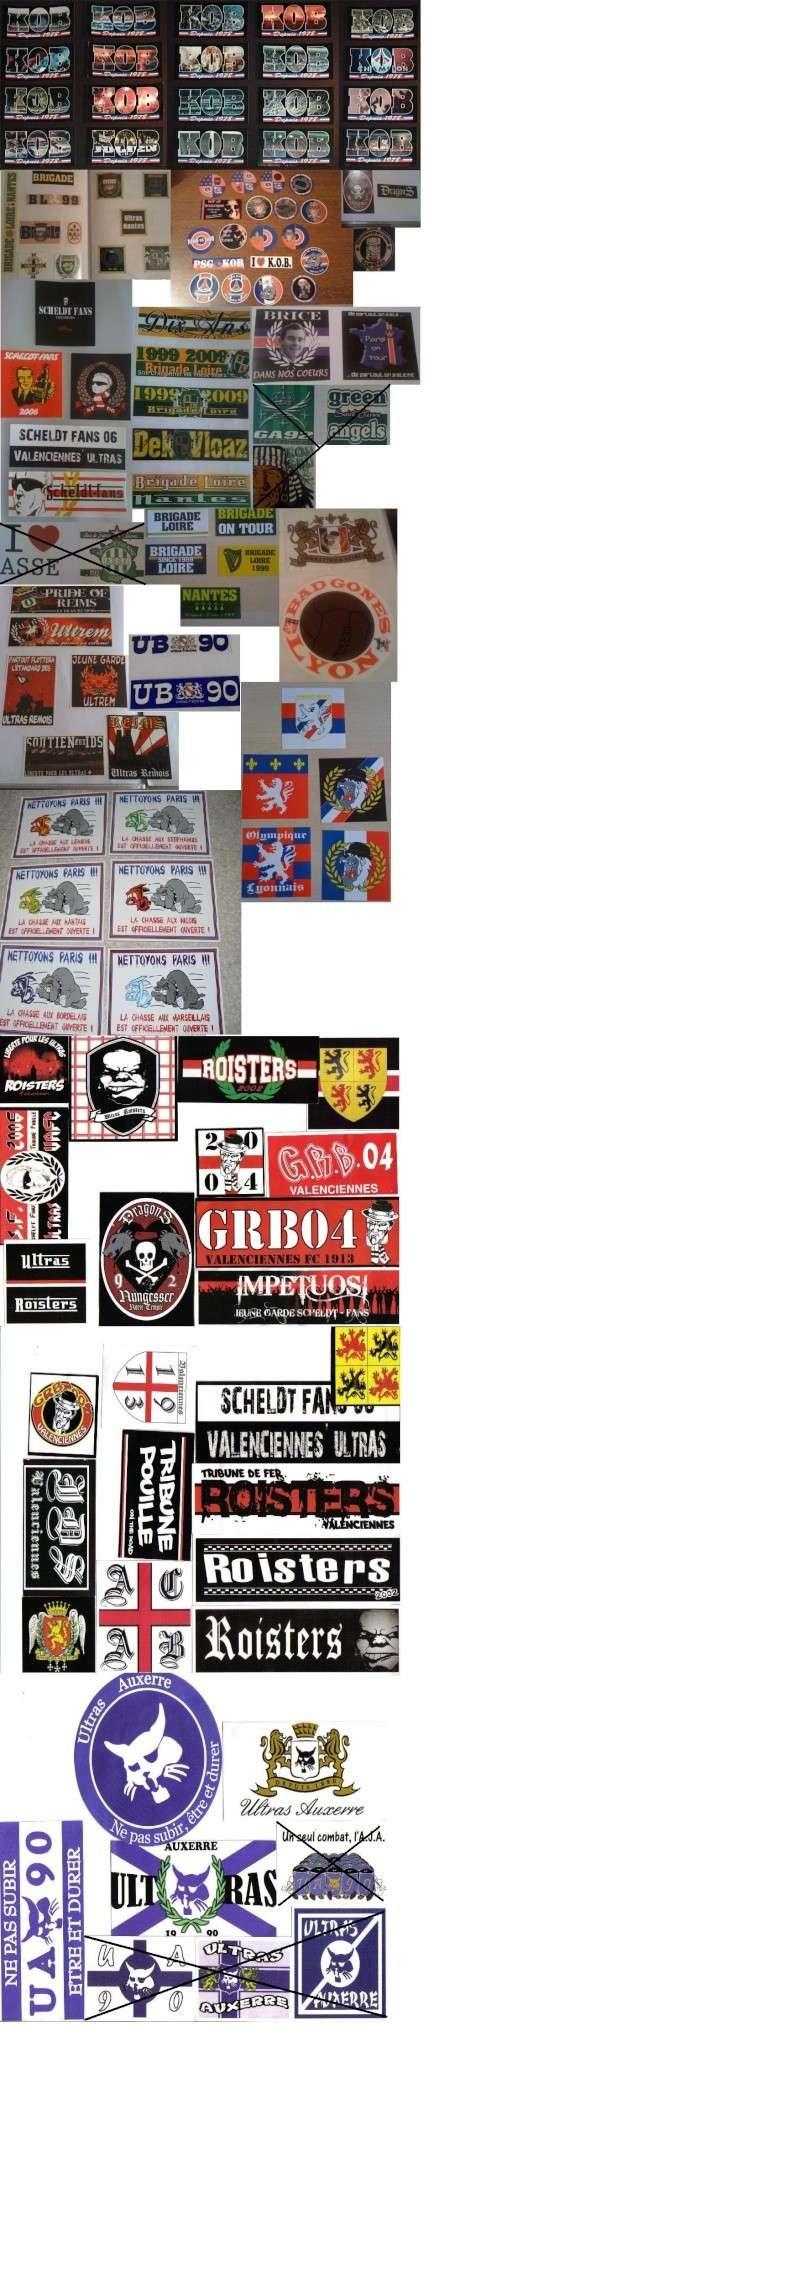 [recherche stickers roisters] Sticks11